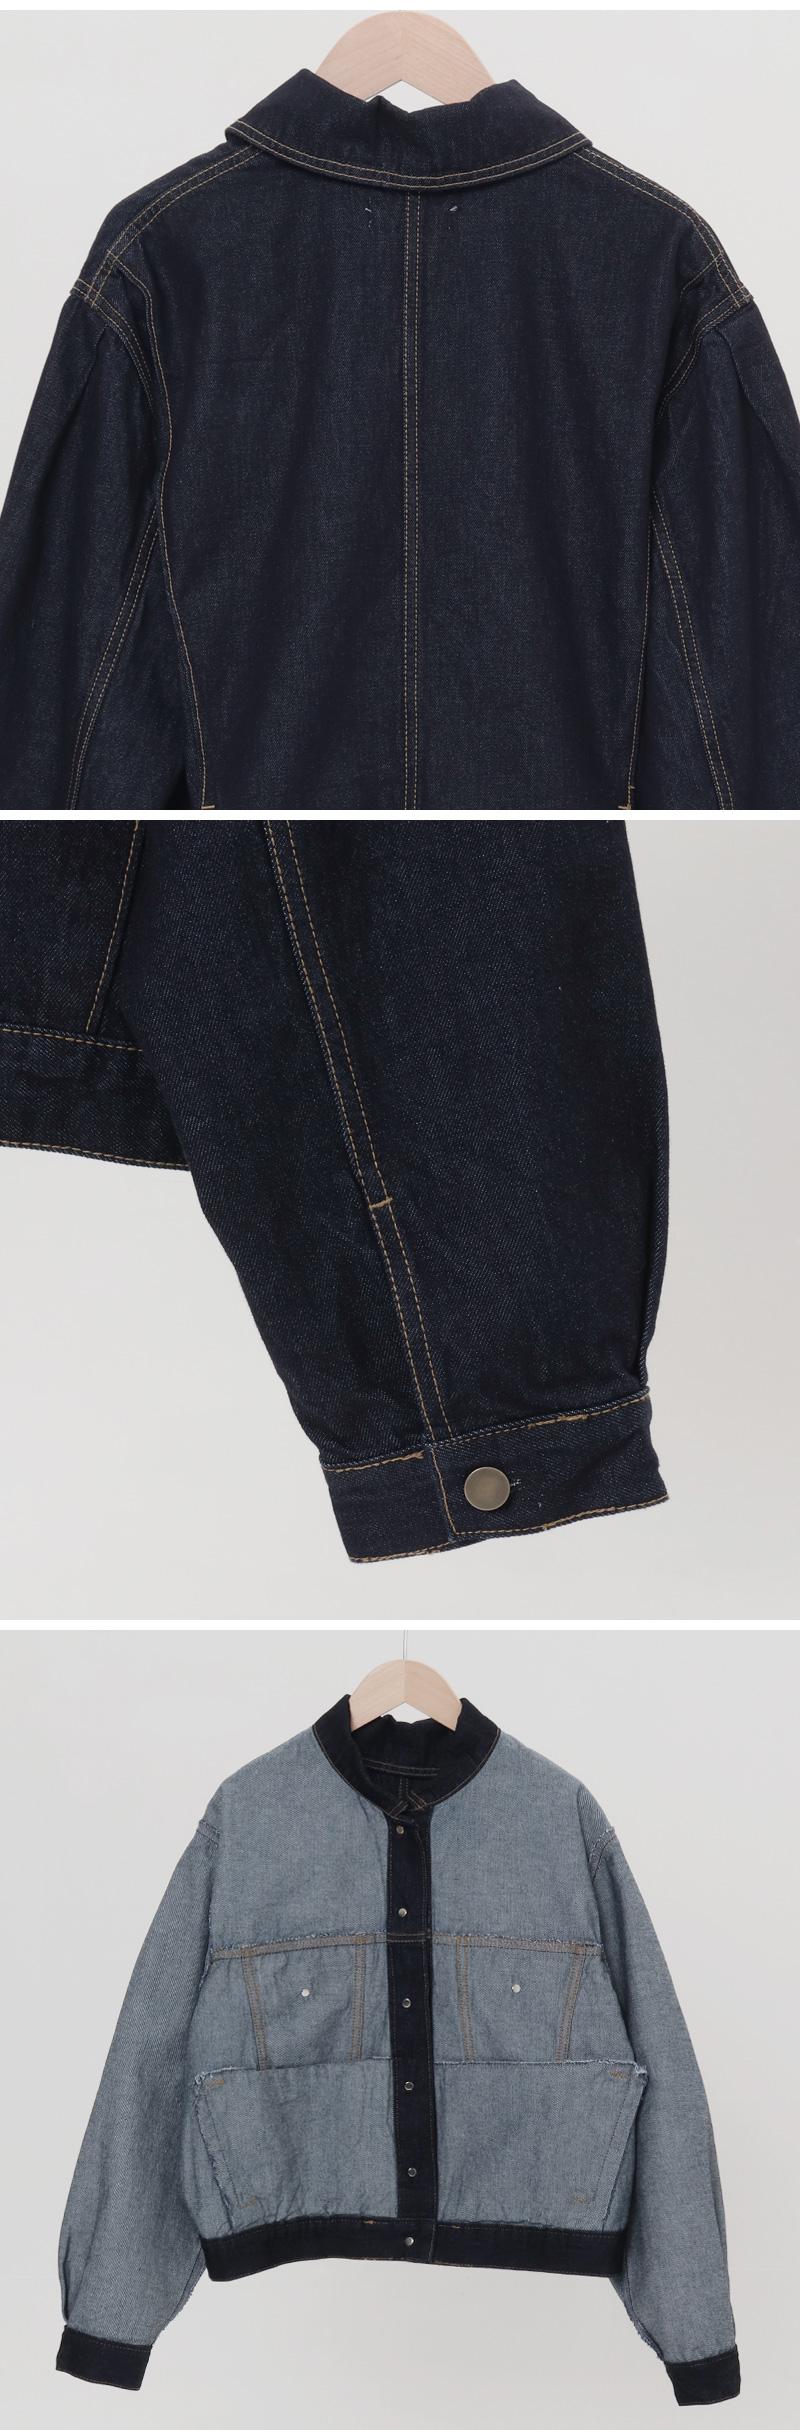 Indigo Blue Overfit Denim Jacket